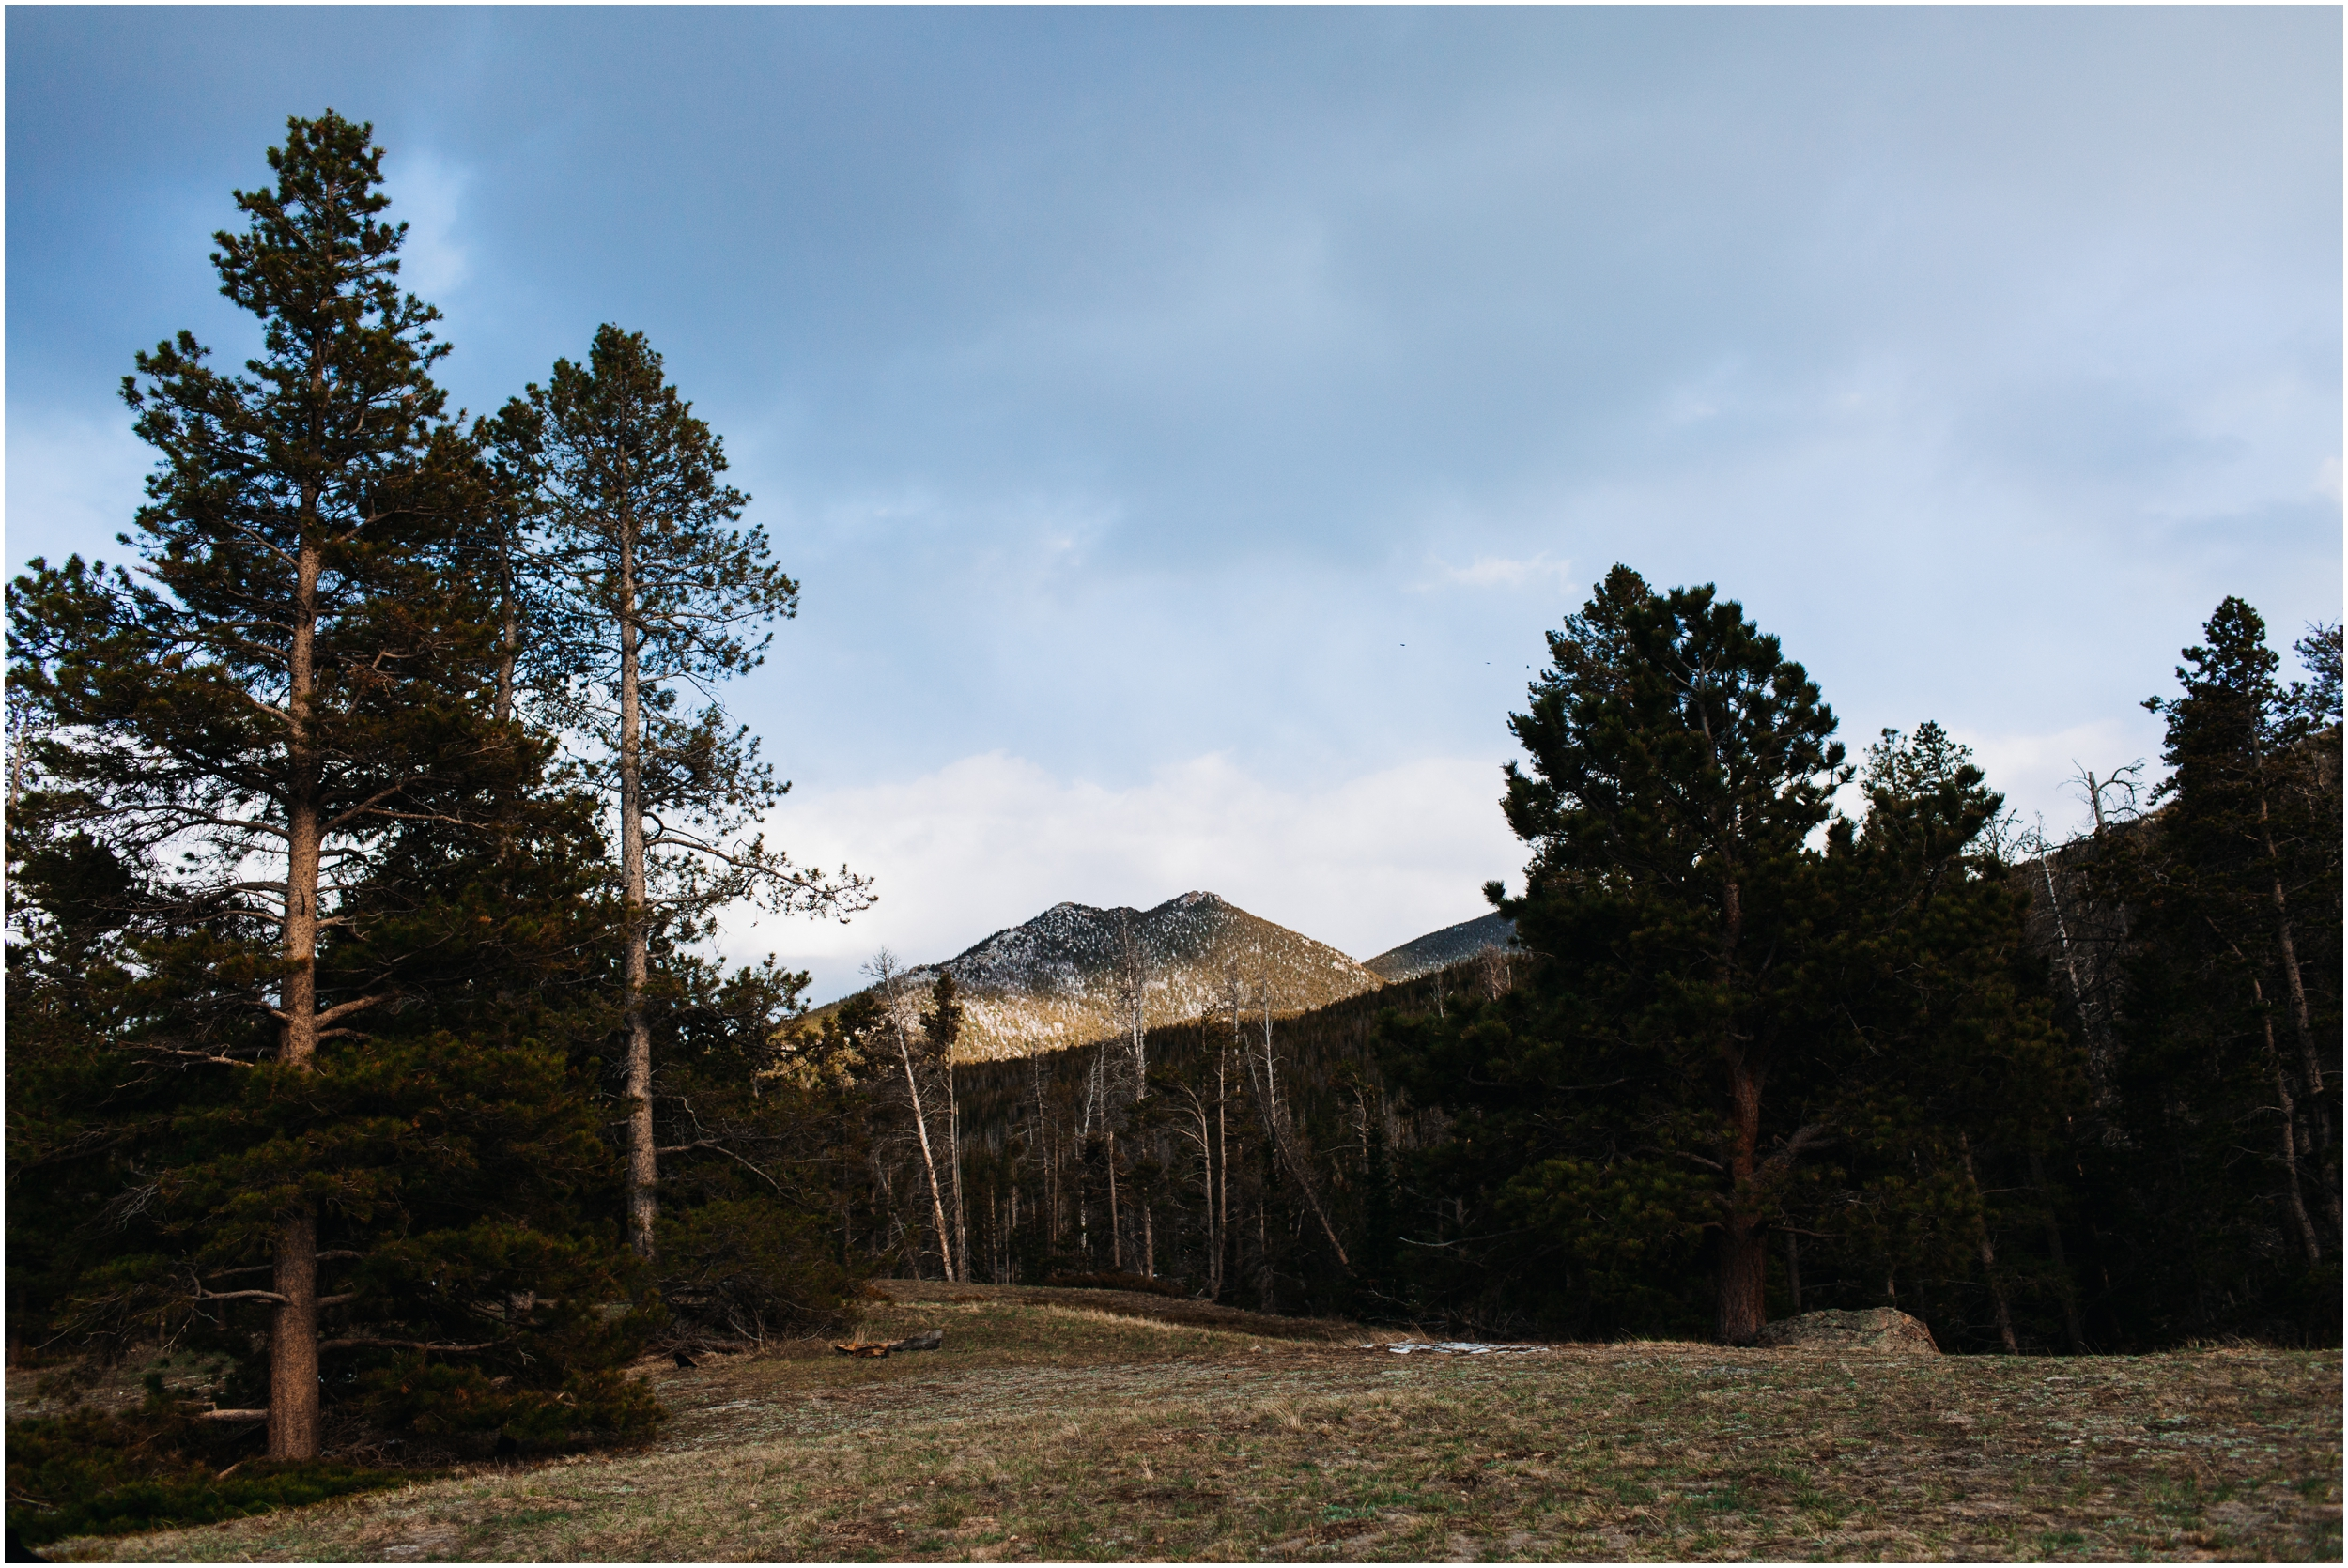 rocky-mountain-national-park-elopement-sprague-lake-colorado-adventure-wedding-photographer_taylor-powers_141.jpg